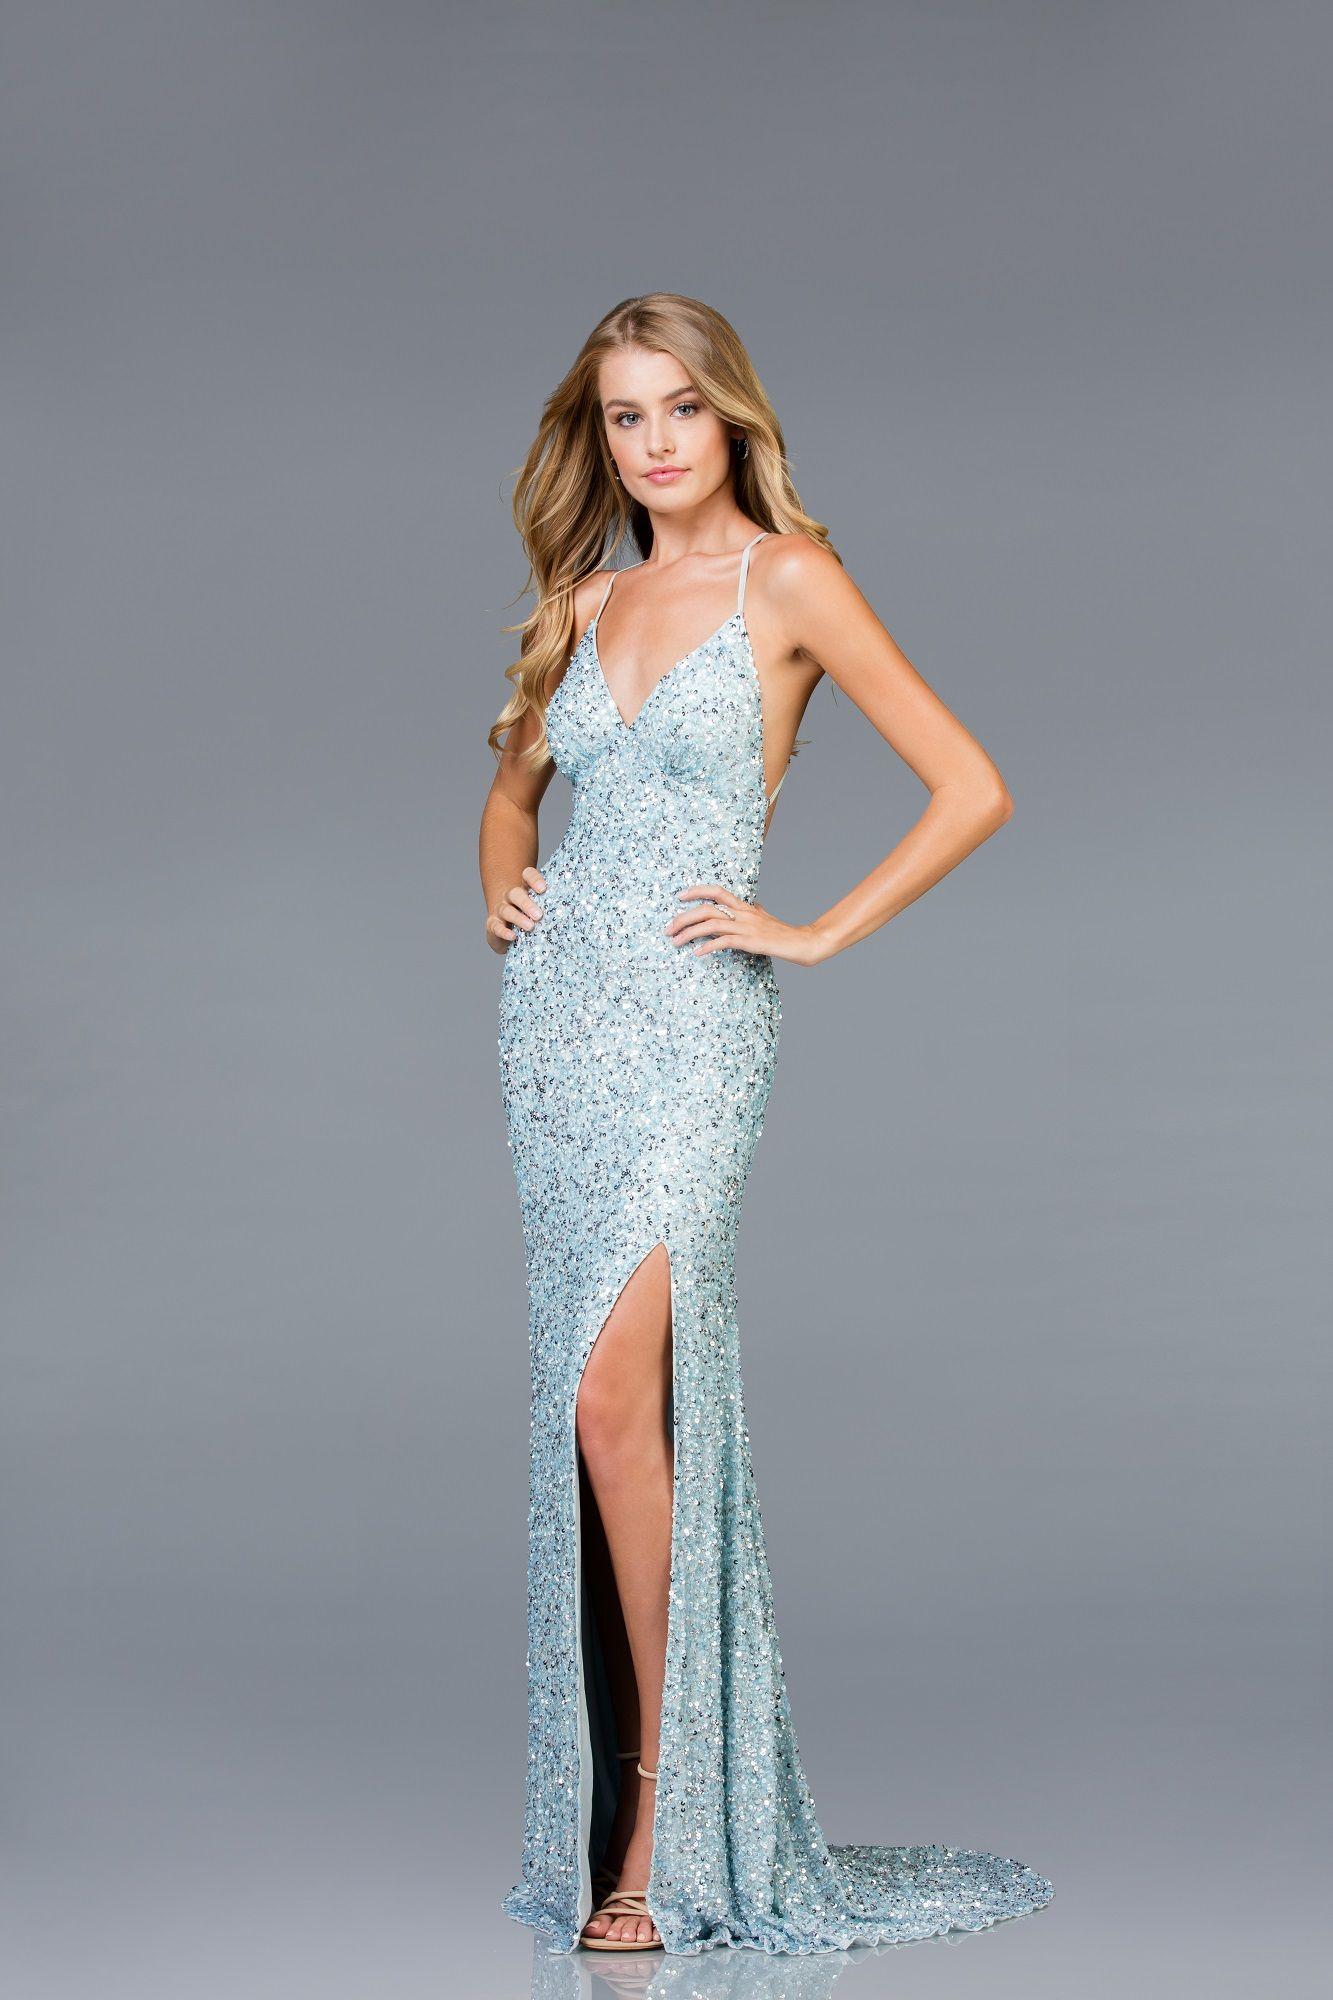 21-48938_Ice Blue_Silver | Dresses, Classy evening dress ...